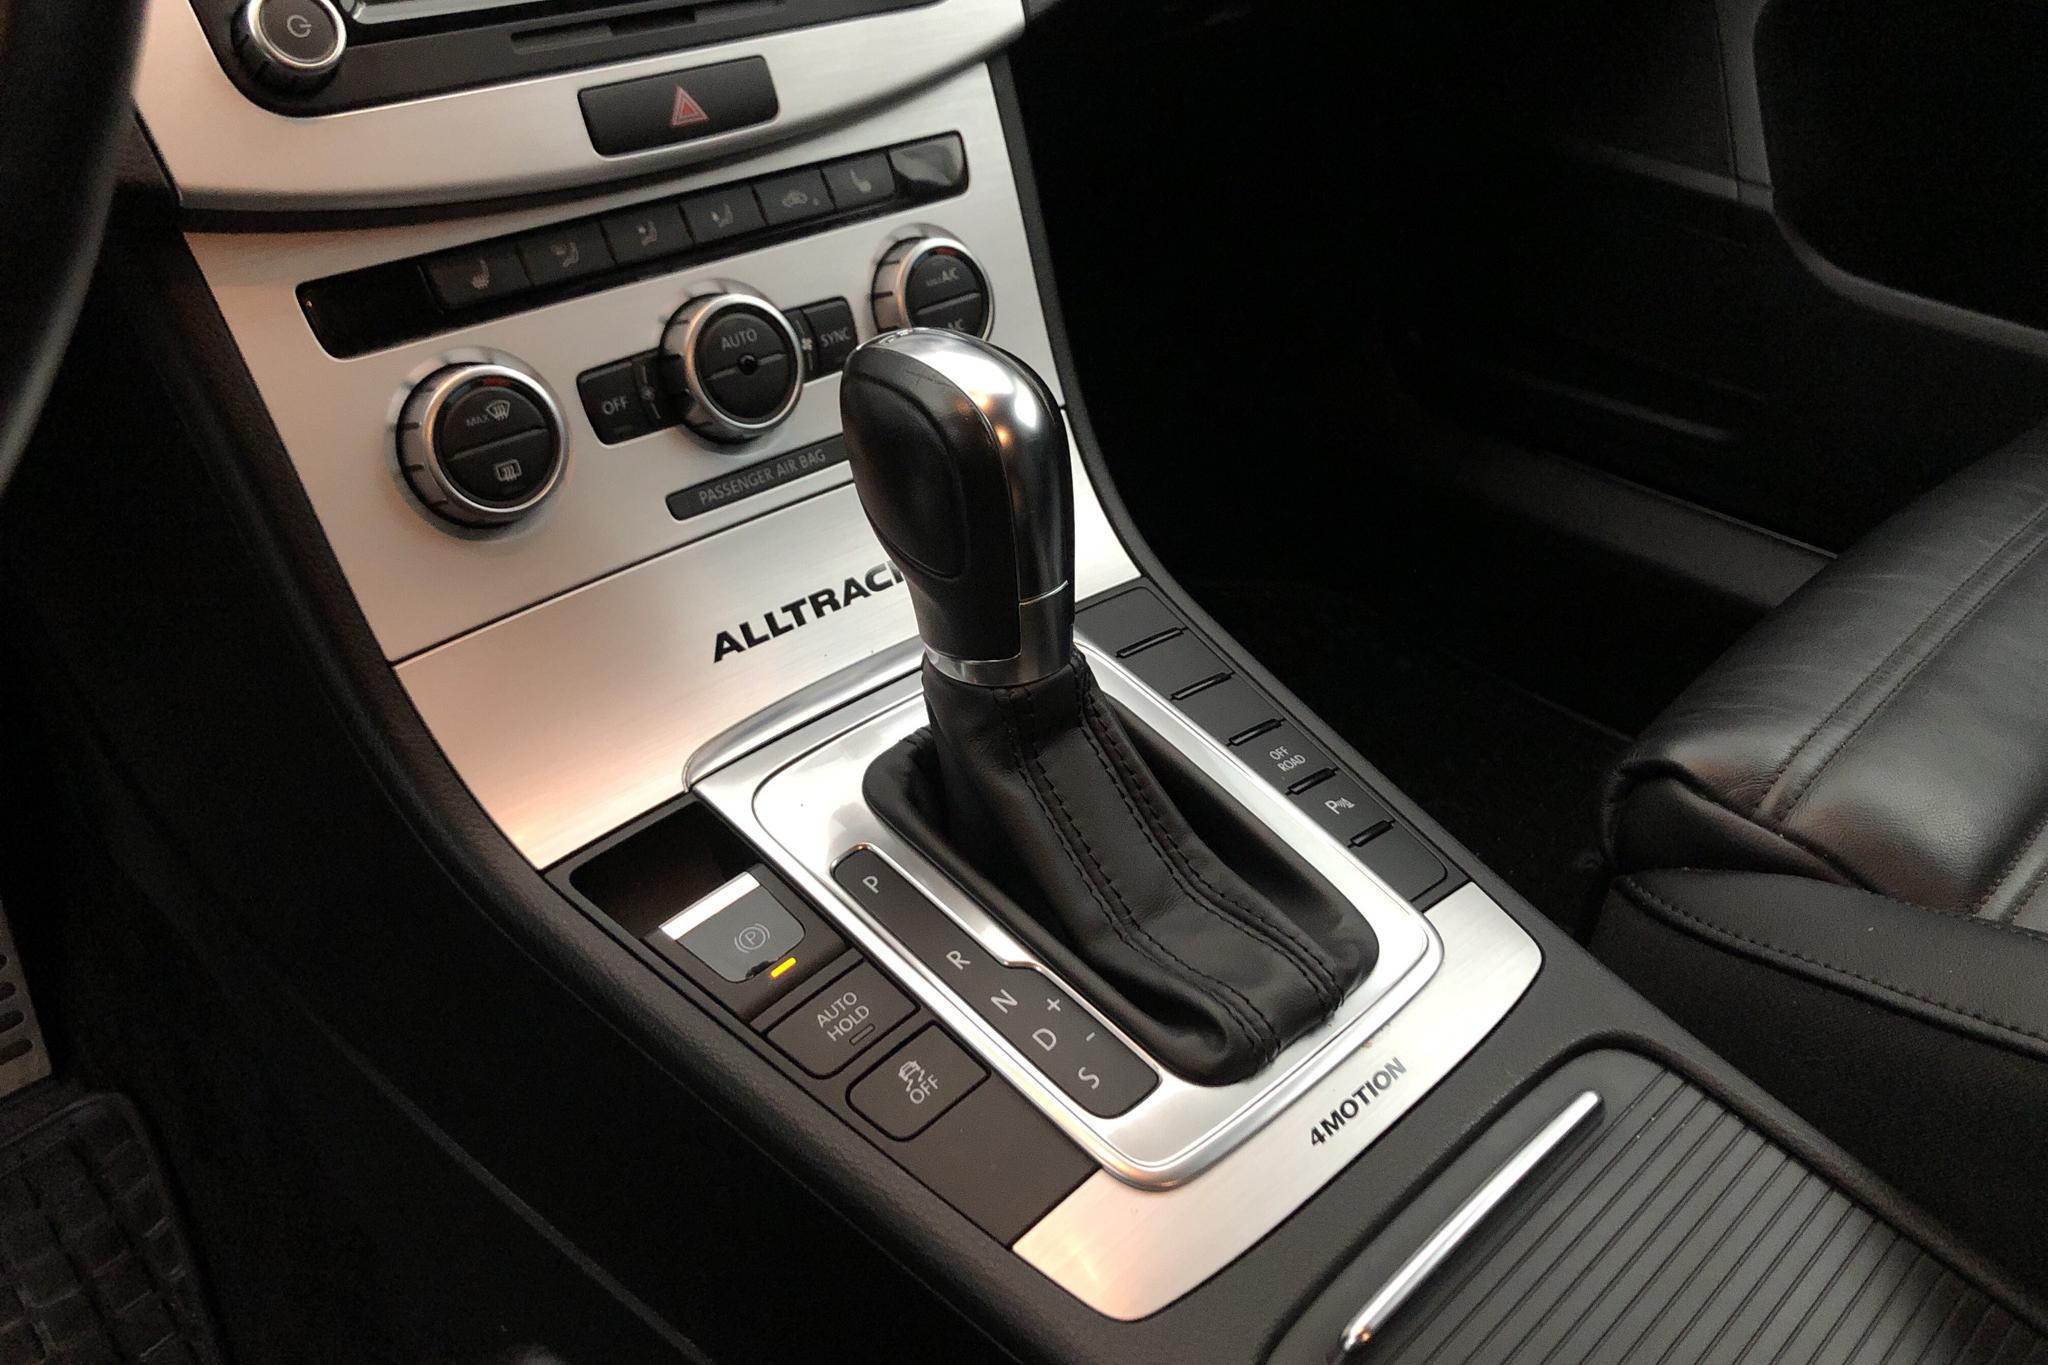 VW Passat Alltrack 2.0 TFSI BlueMotion Technology 4Motion (211hk) - 12 507 mil - Automat - Dark Red - 2014